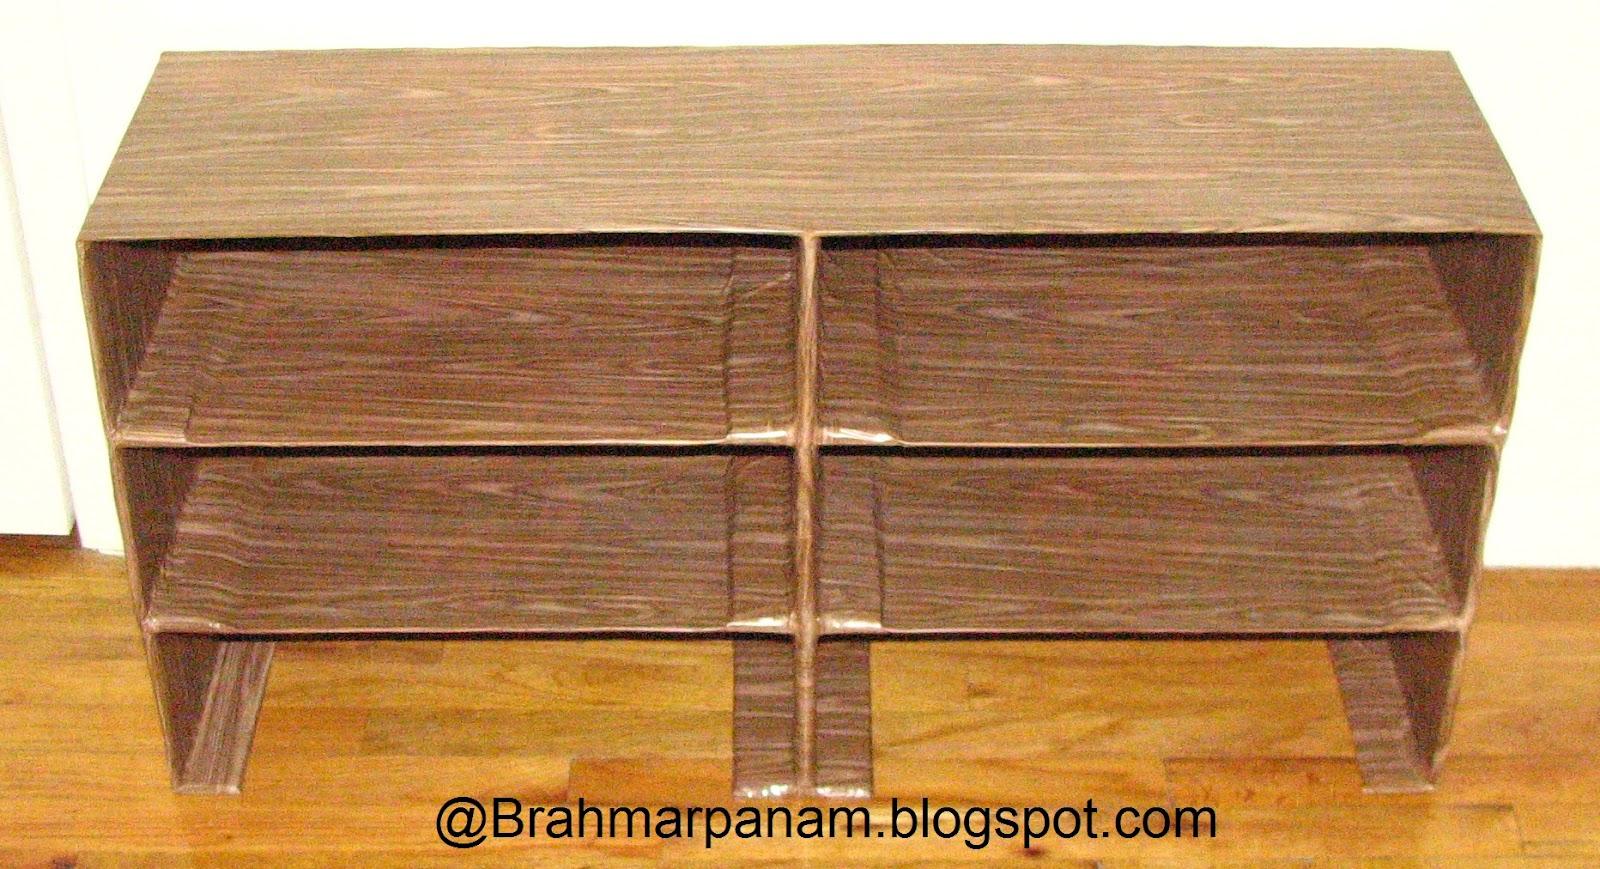 Brahmarpanam make your own cardboard shoe rack for Diy shoe storage with cardboard